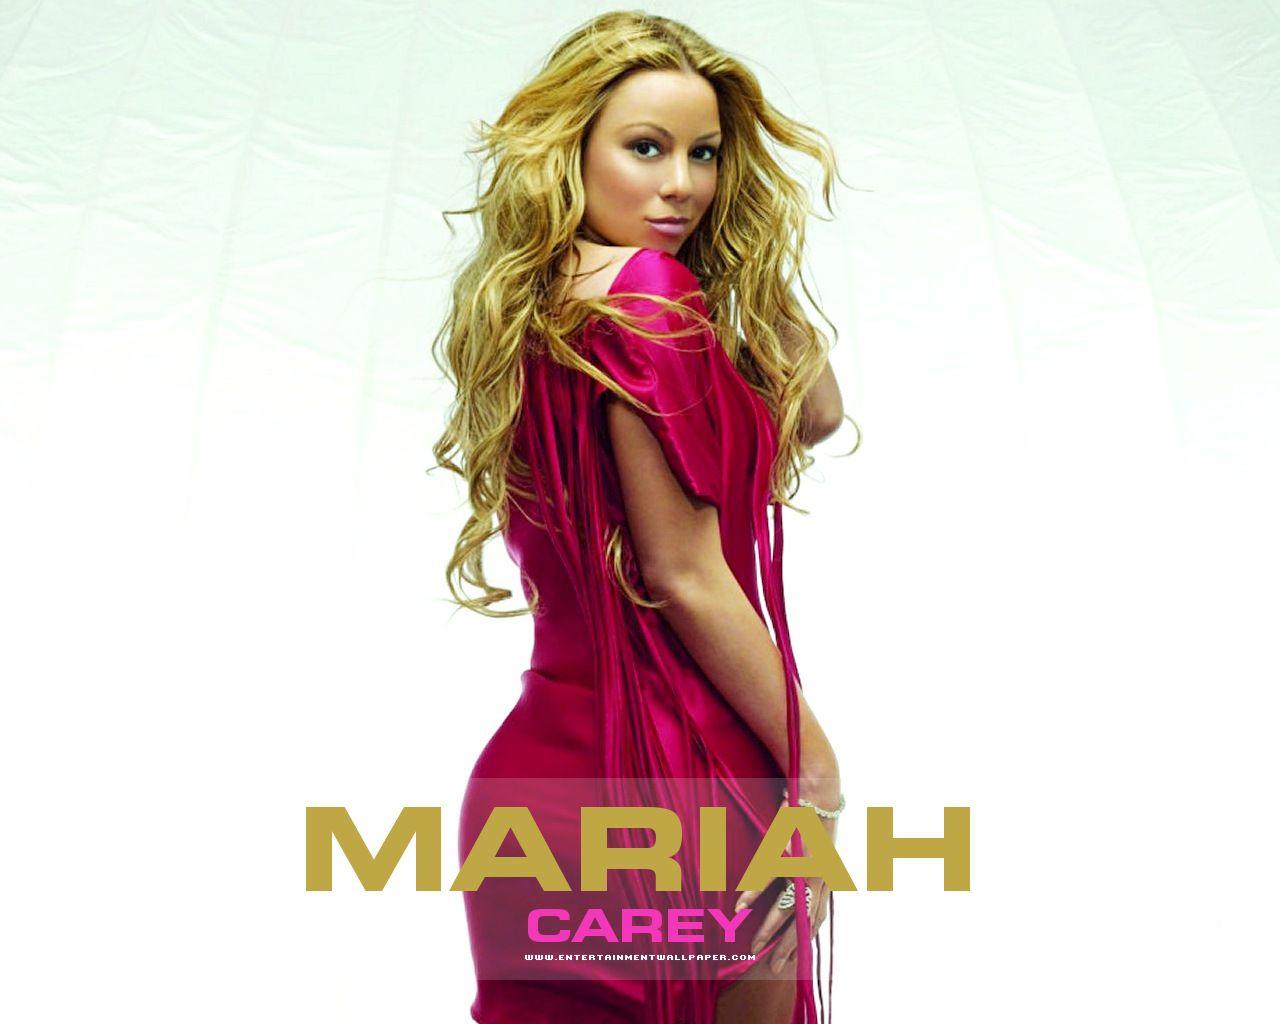 Mariah Carey Wallpaper WallDevil